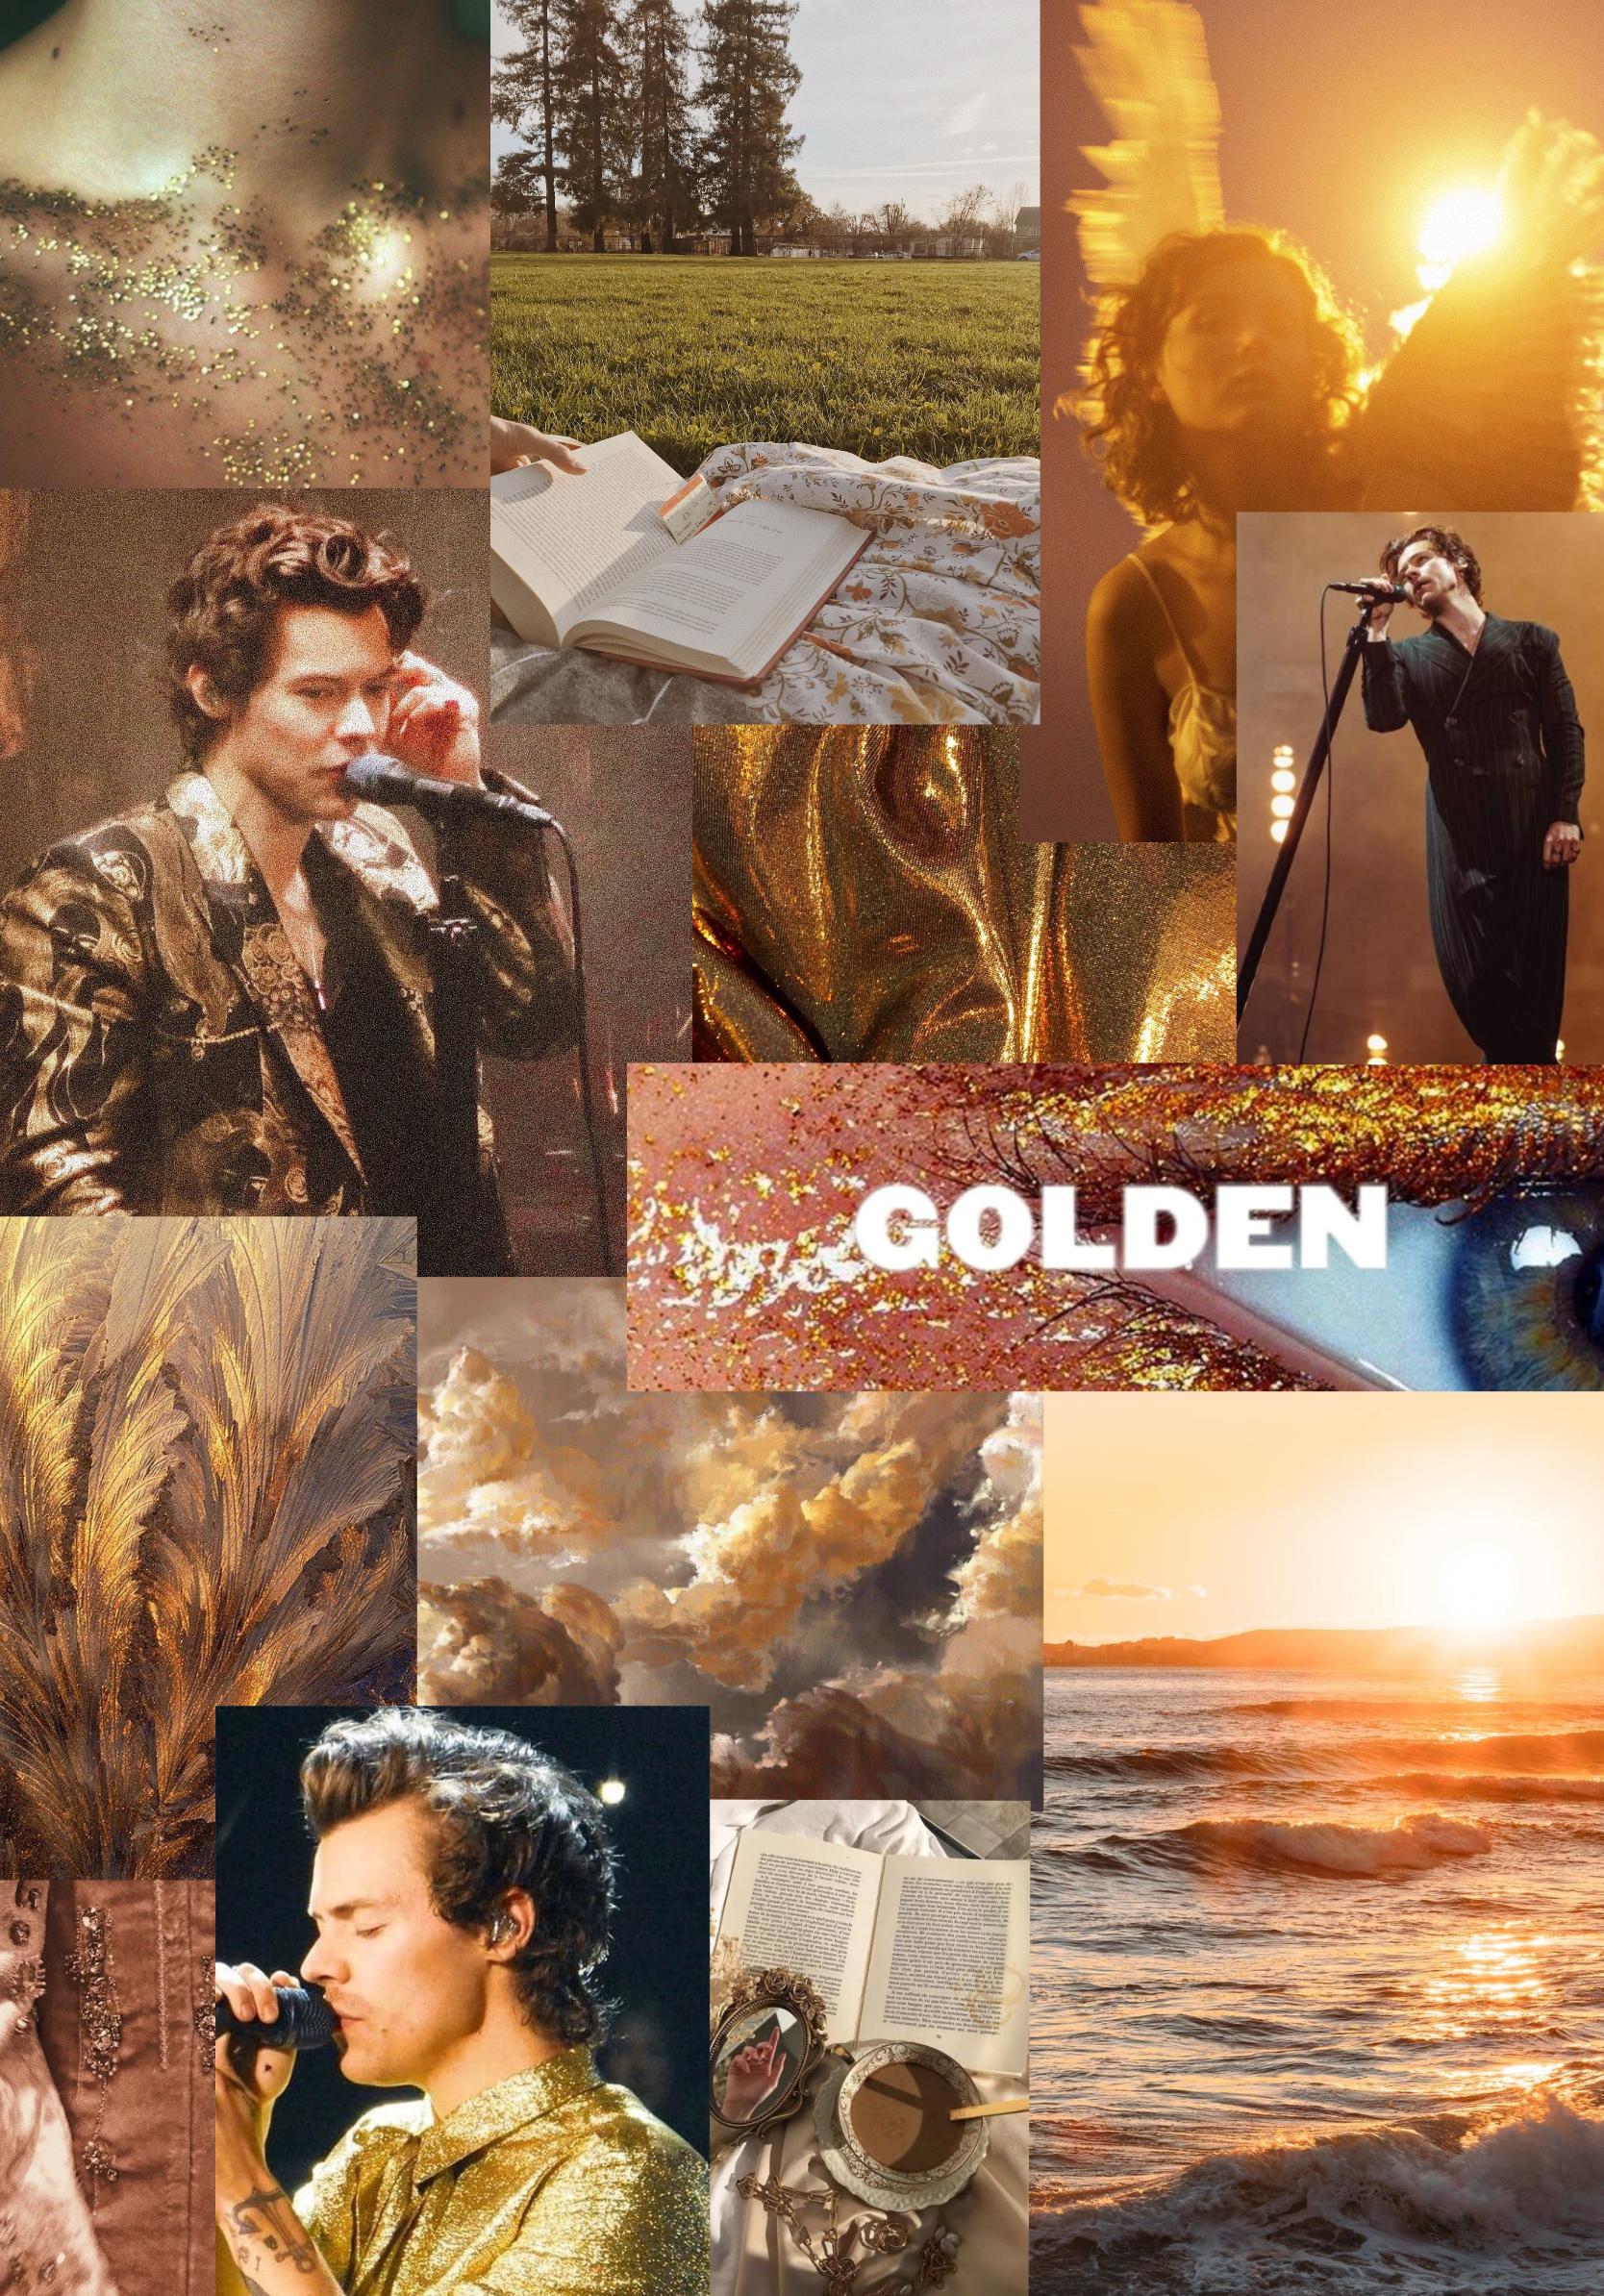 Harry Styles Golden Aesthetic Wallpaper In 2020 Harry Styles Photos Harry Styles Pictures Harry Styles Wallpaper